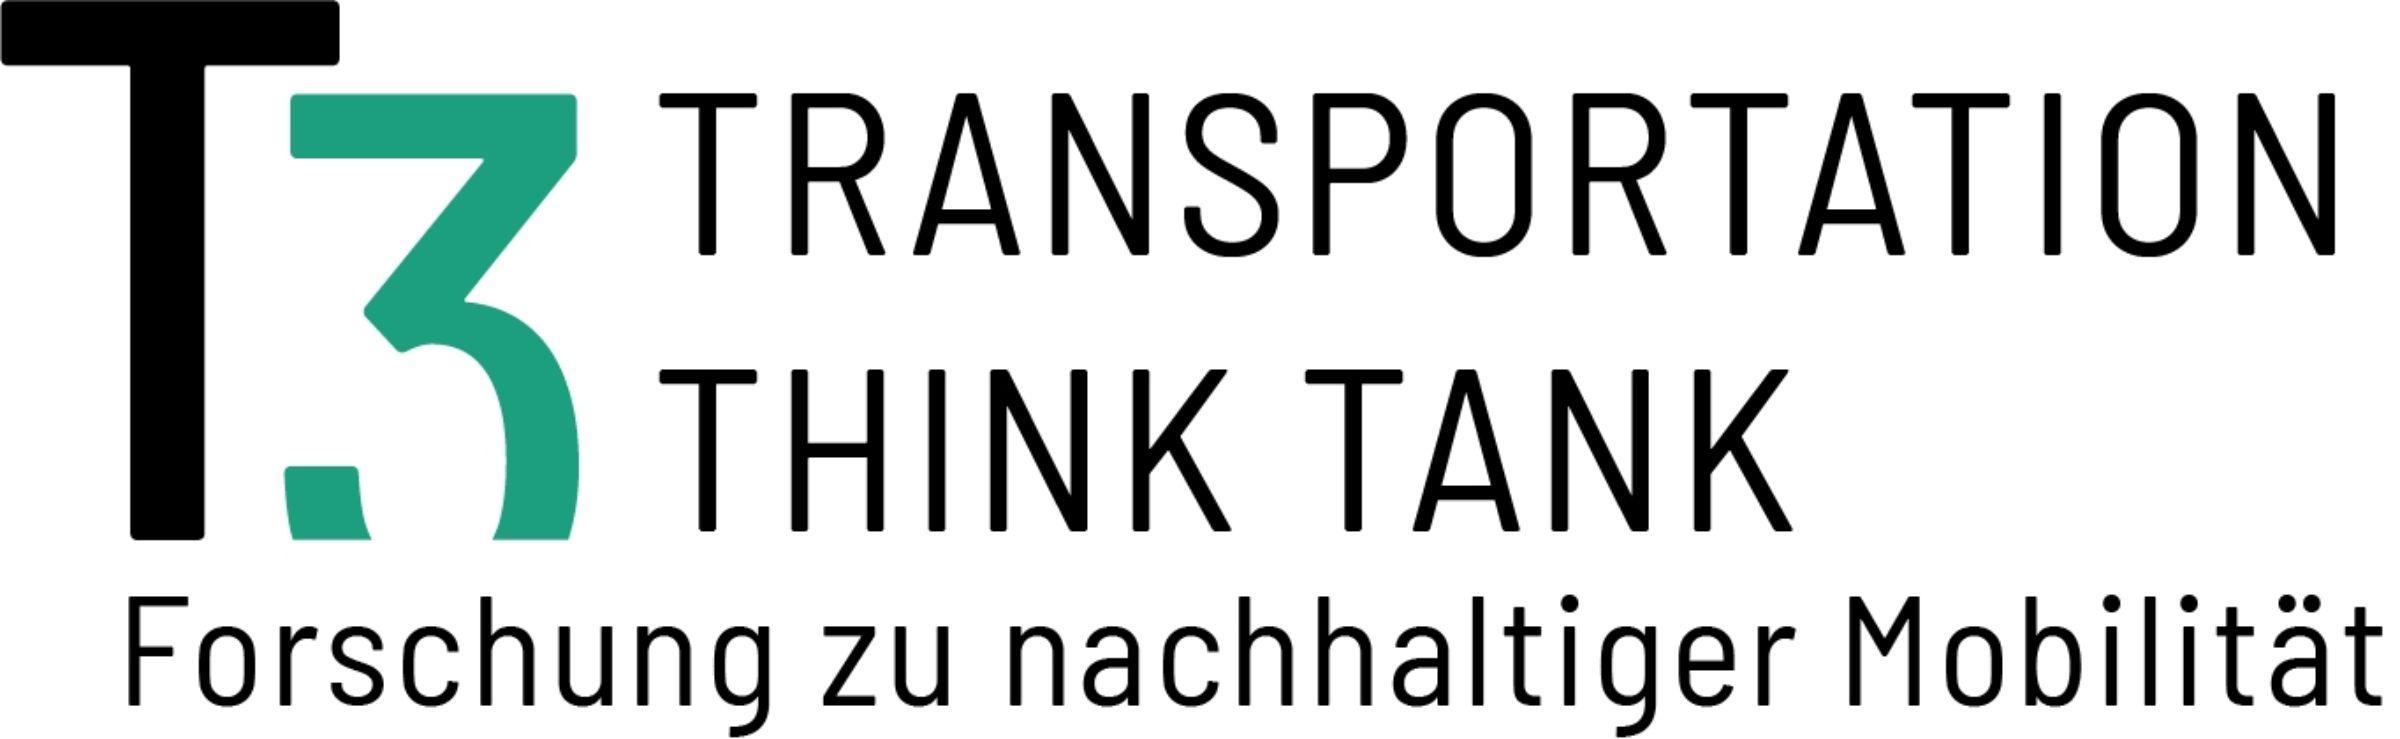 Logo T3 Transportation Think Tank